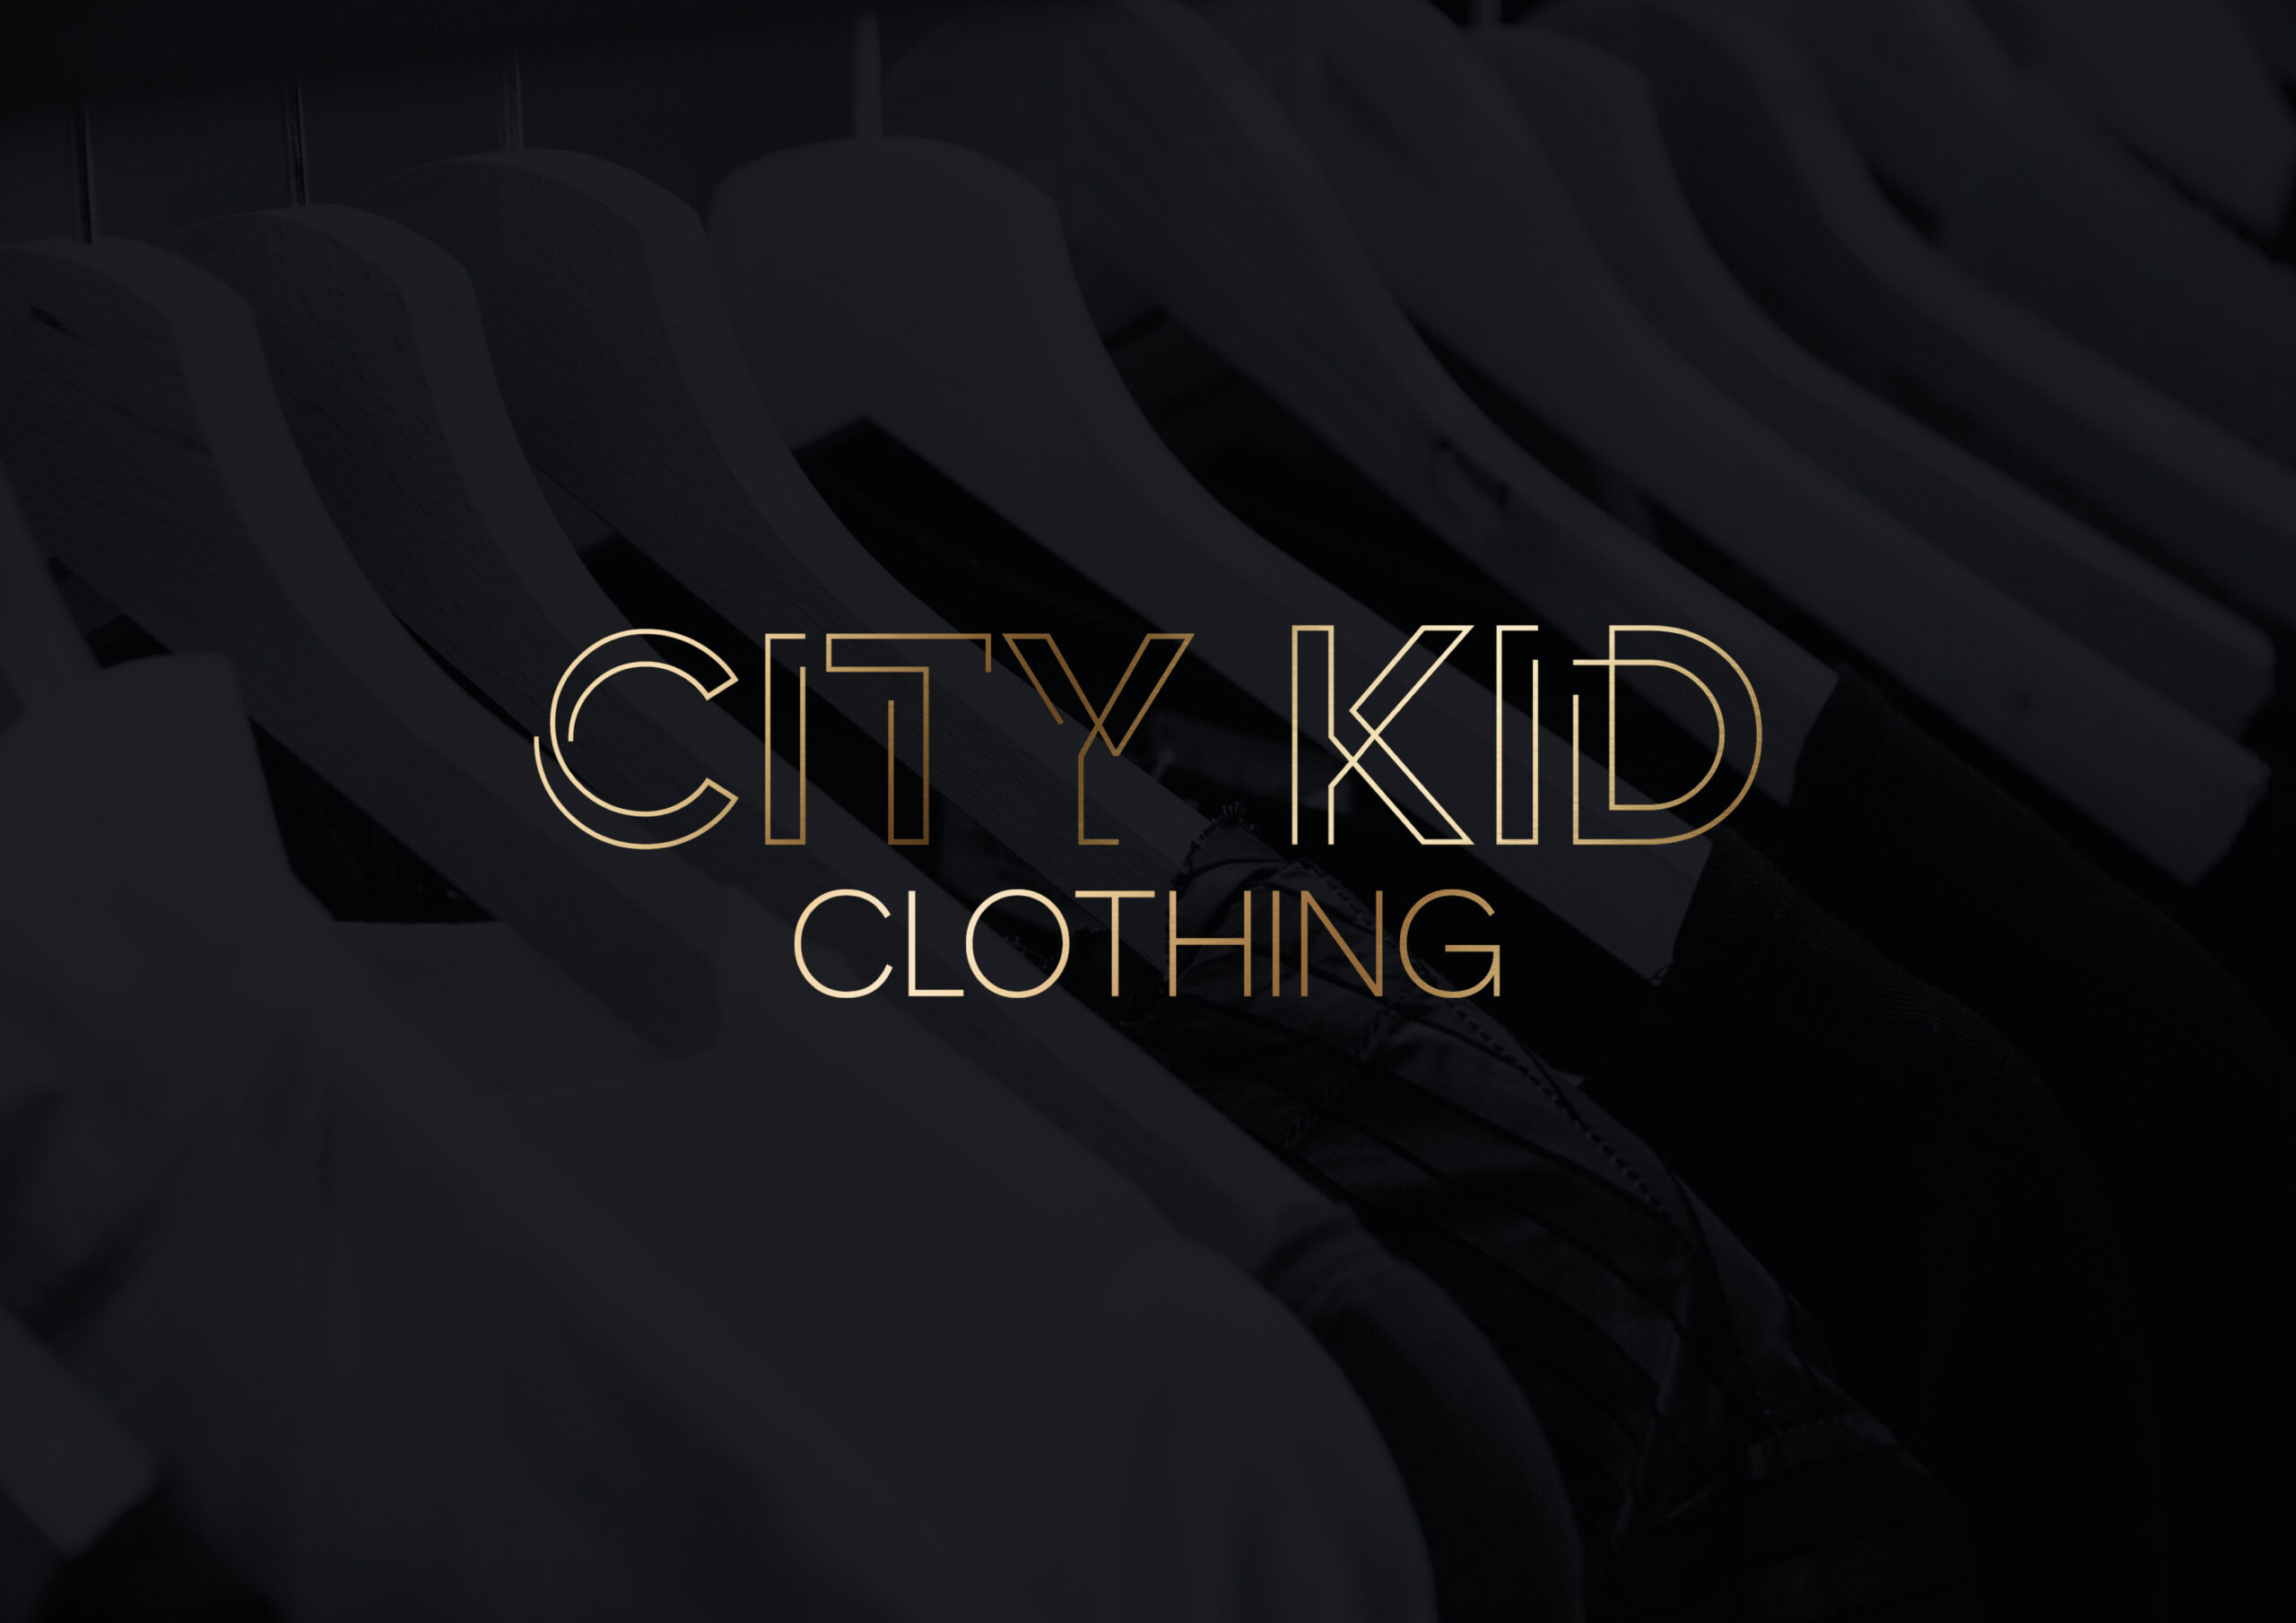 City kid clothing lthumbnail